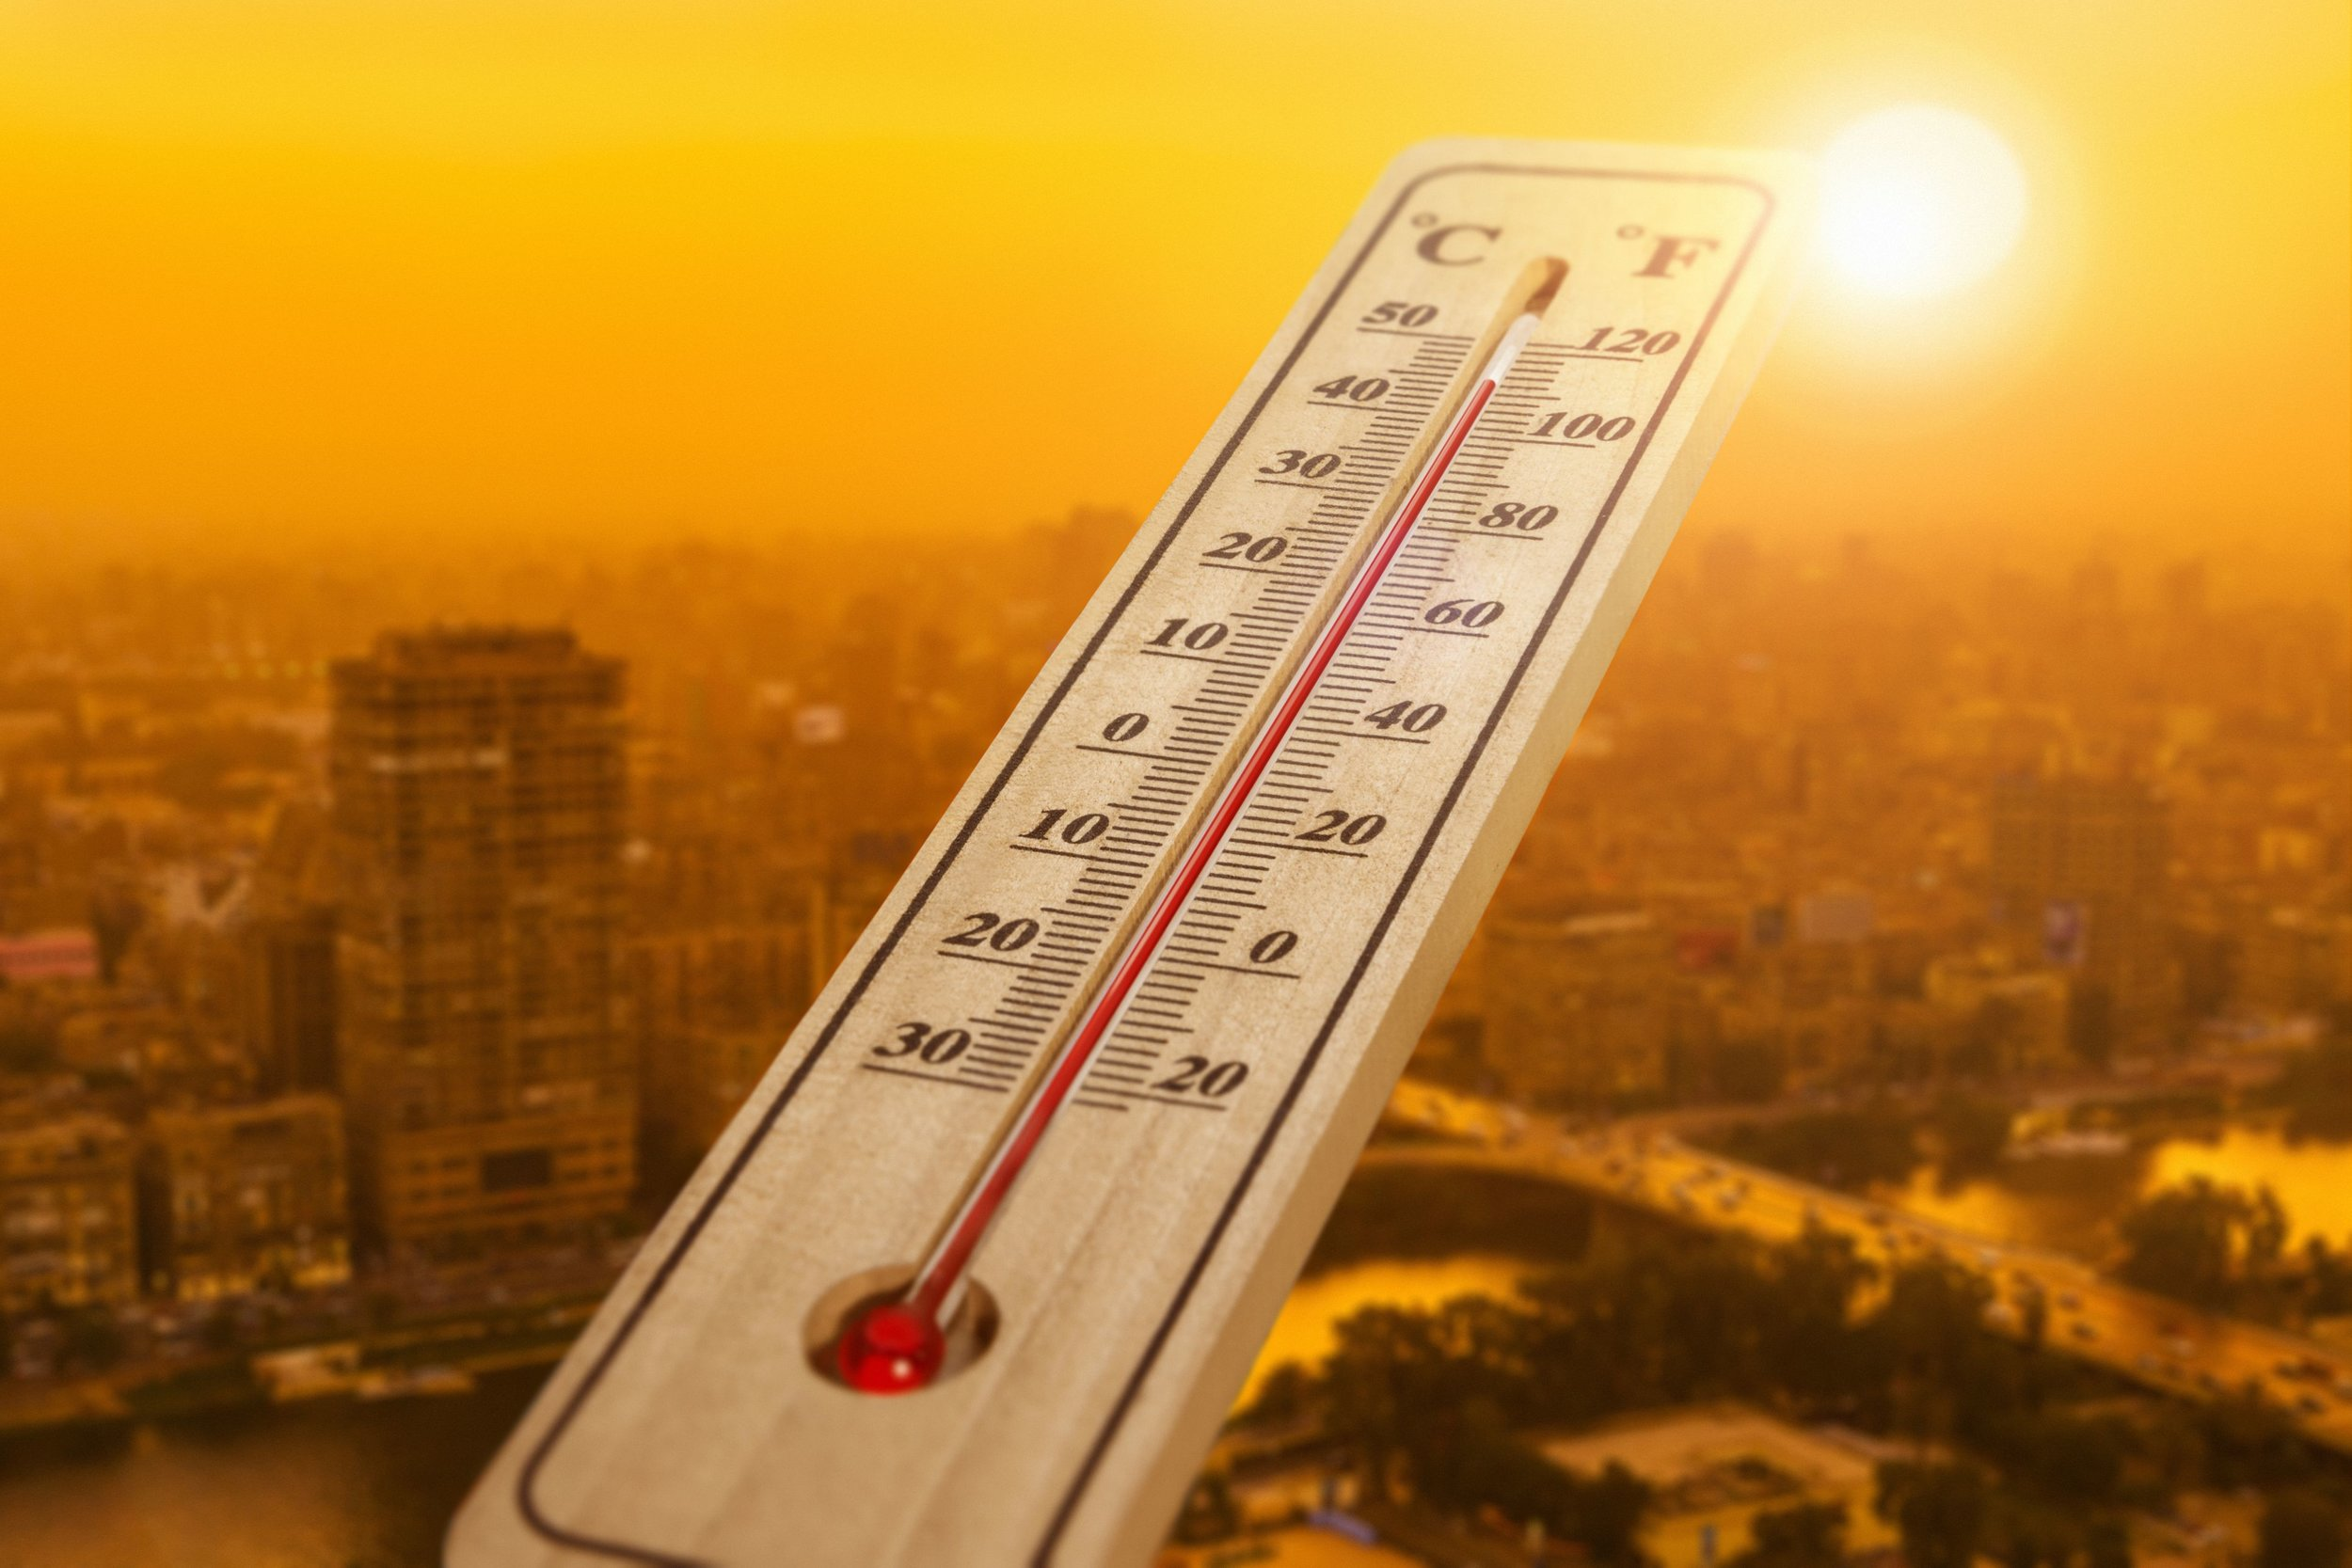 Cal-OSHA-indoor-heat-illness-prevention.jpg